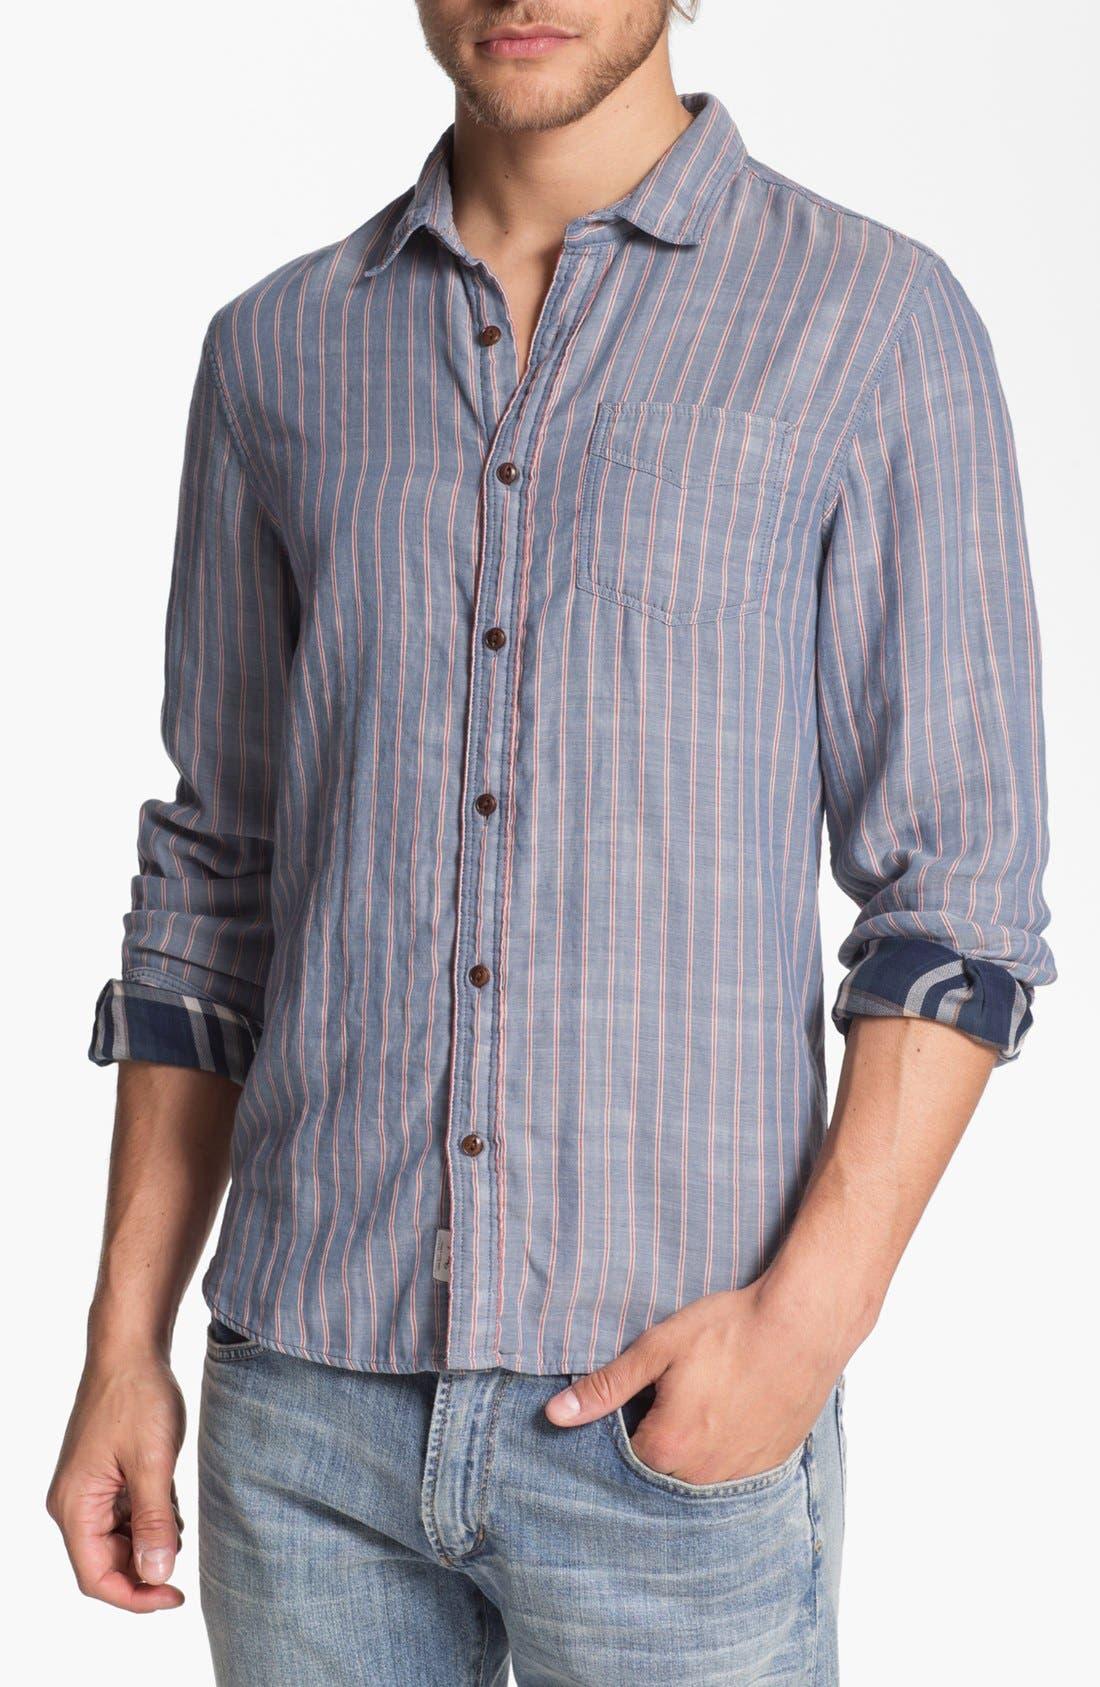 Main Image - Woolrich'William' Woven Shirt